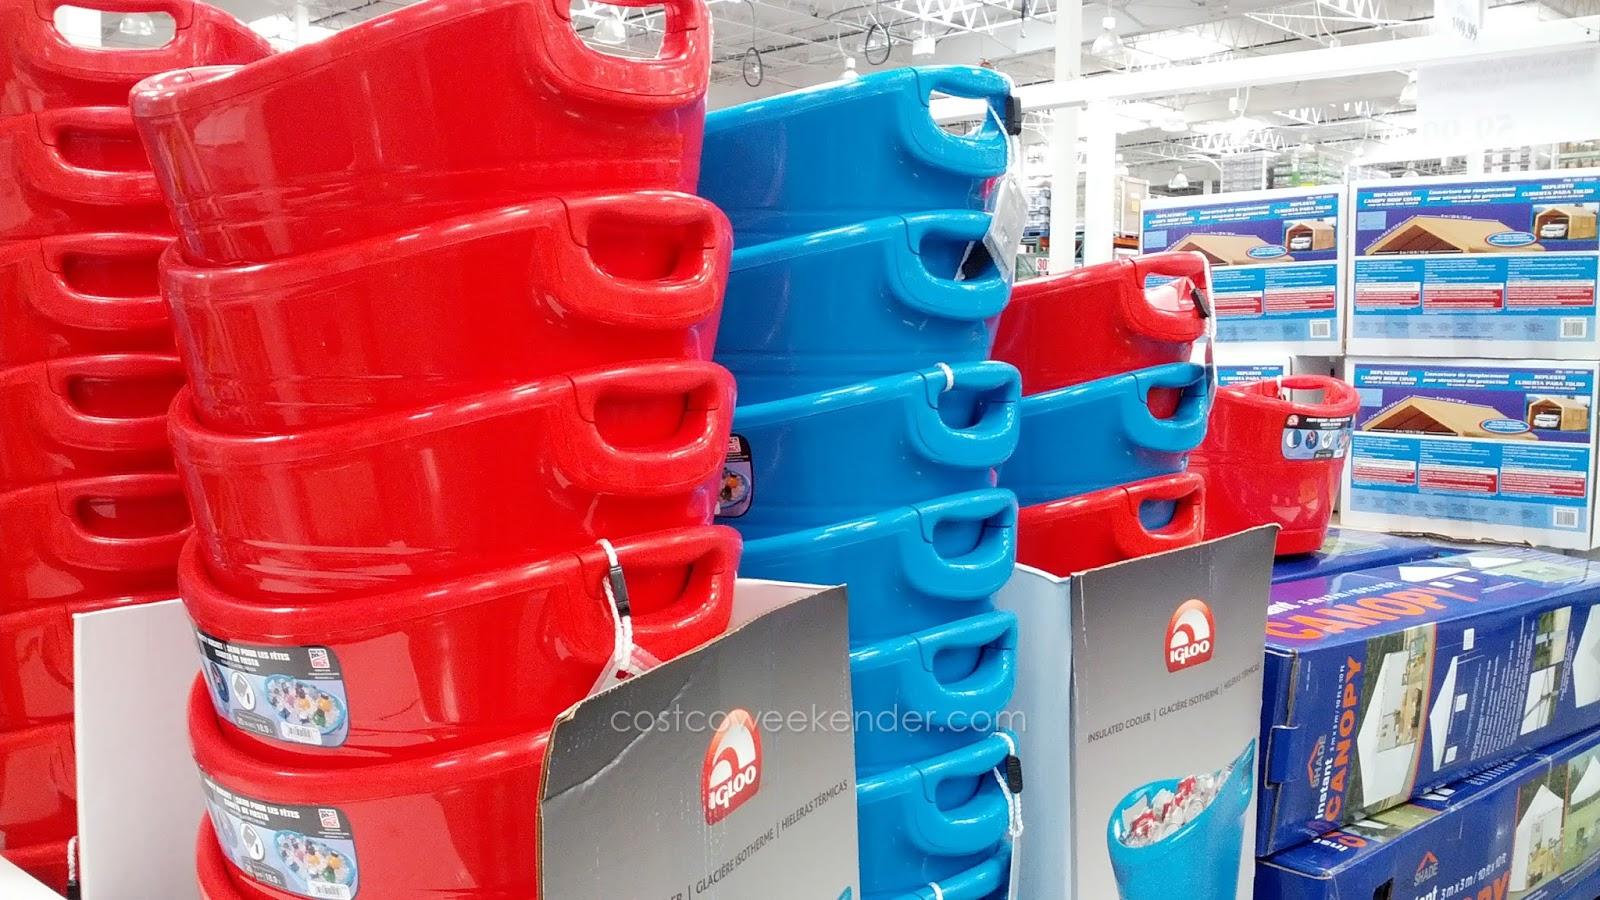 Igloo Insulated Party Bucket Cooler Costco Weekender